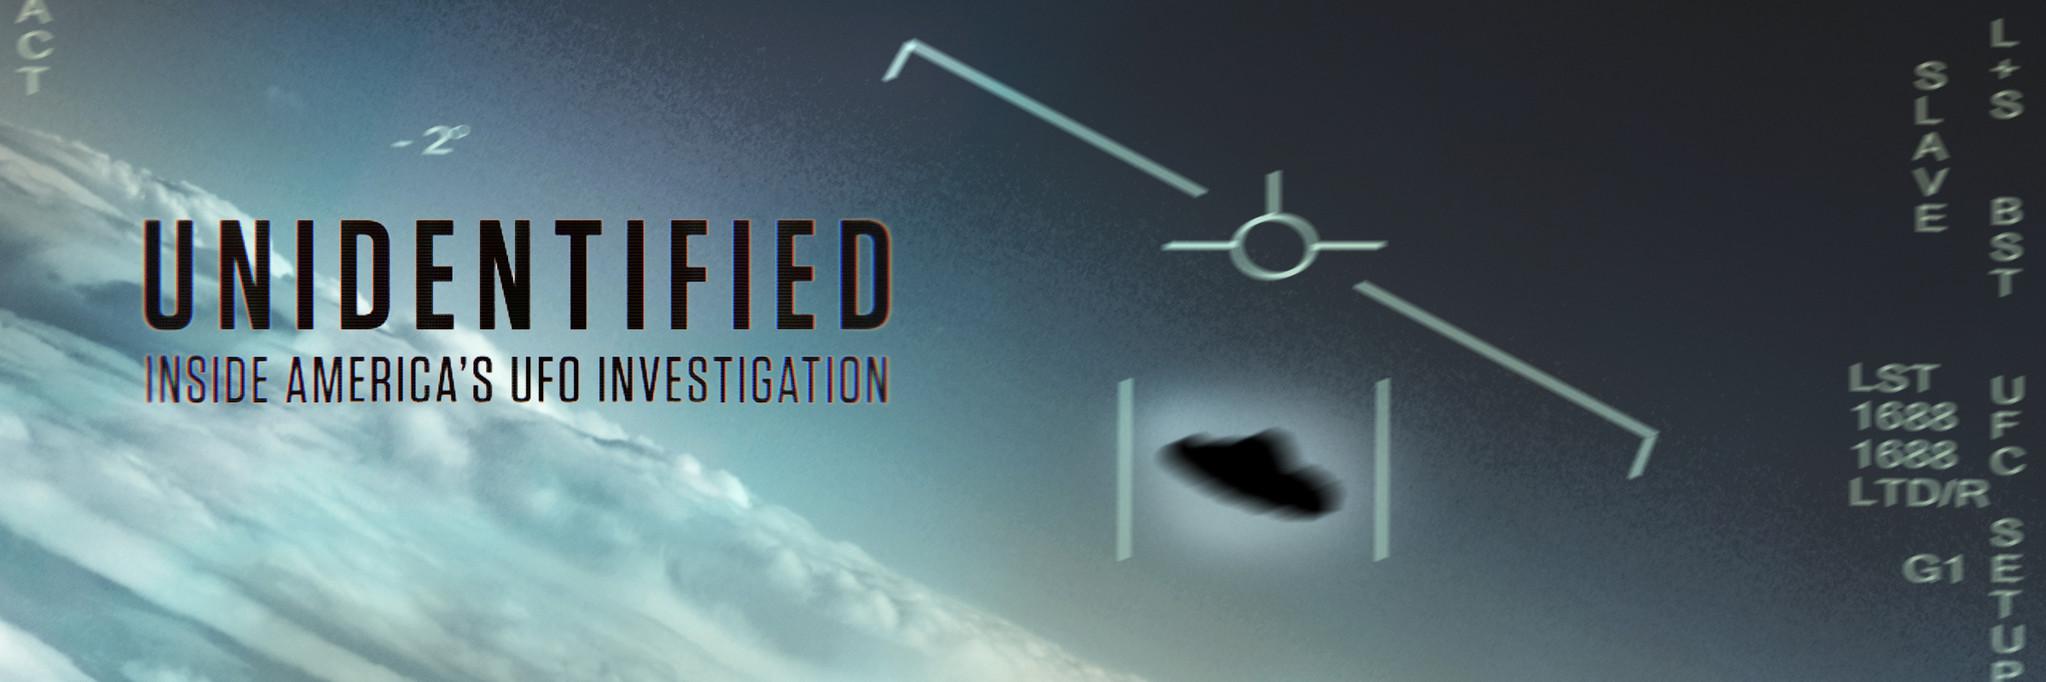 UFOは、海中も自在に移動!海軍パイロットの目撃証言を世界で初めて ...